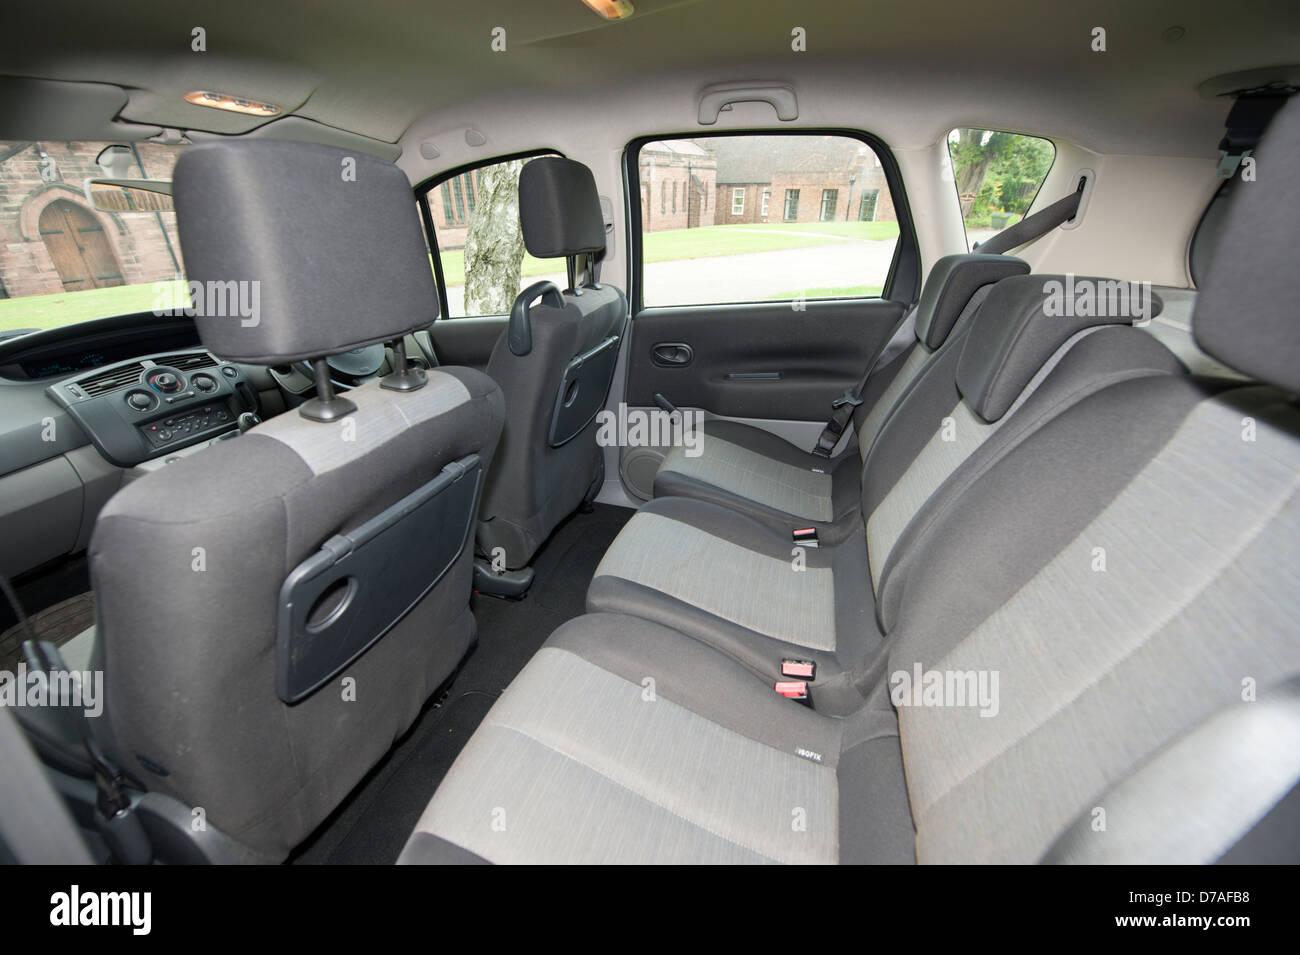 Inside Interior Renault Scenic Car Stock Photos & Inside Interior ...